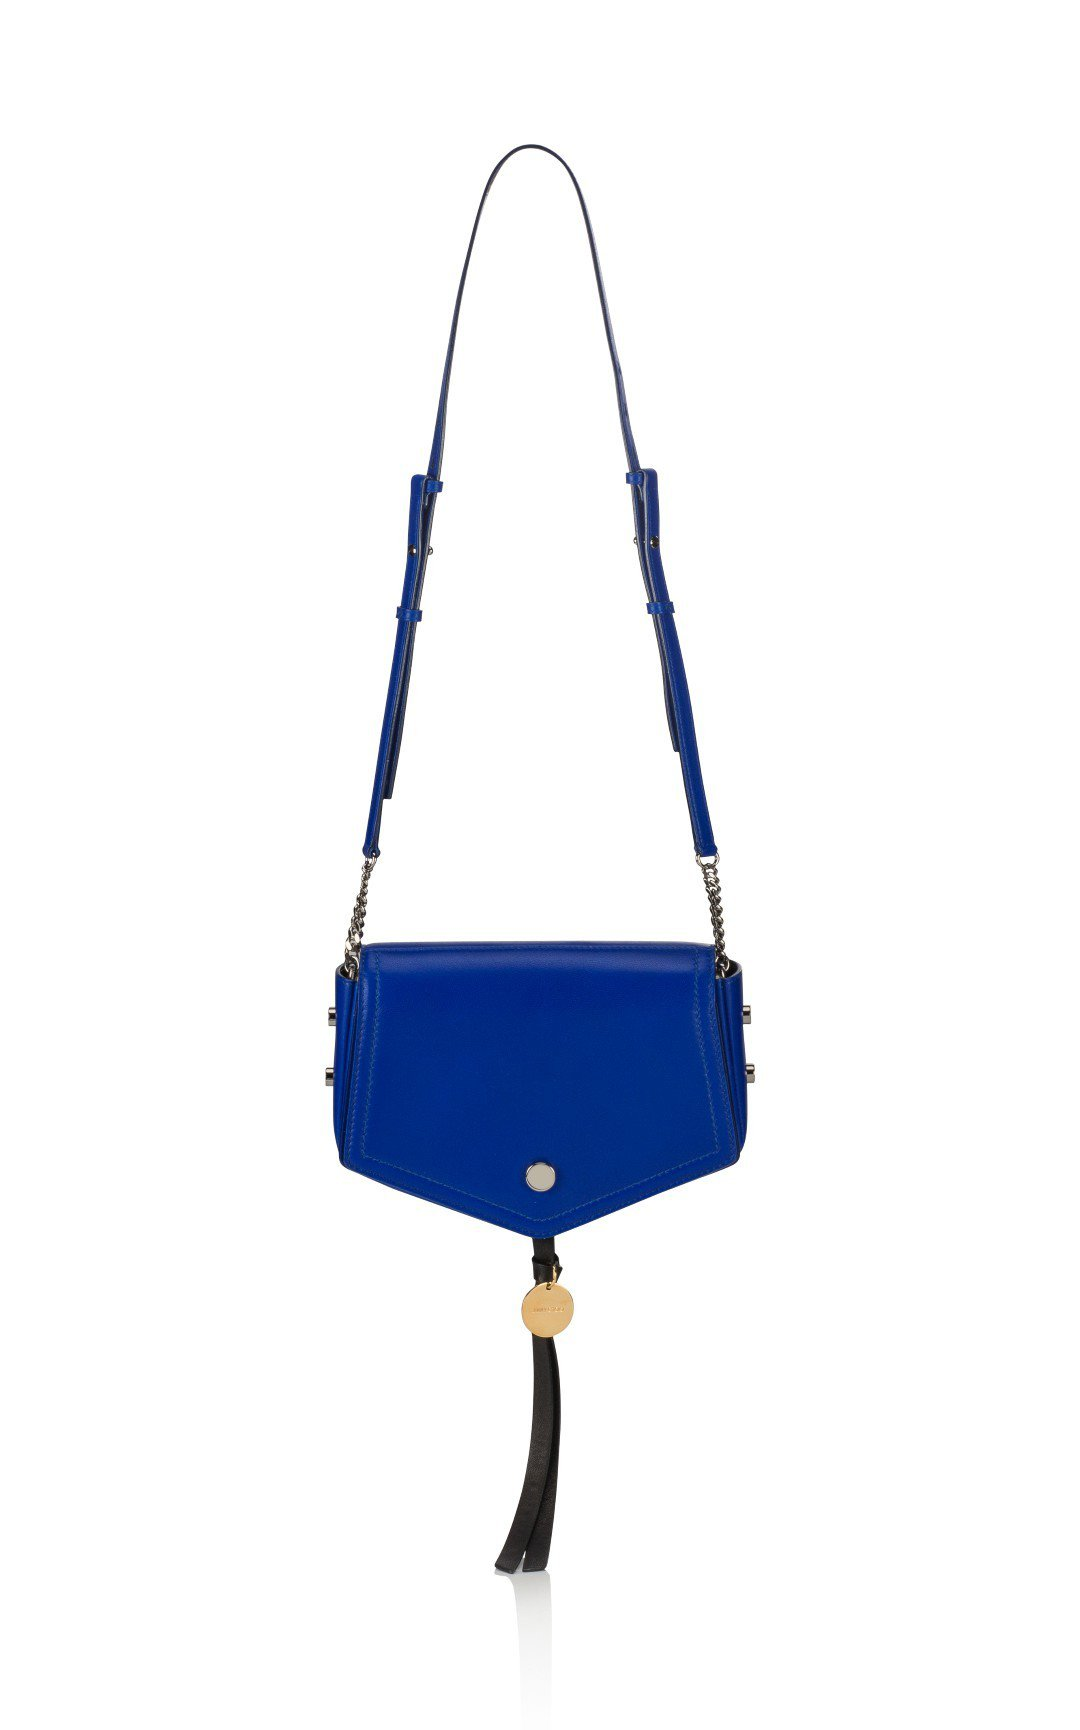 OnTheList特賣會上JIMMY CHOO的ARROW藍色流蘇揹袋,原價40...